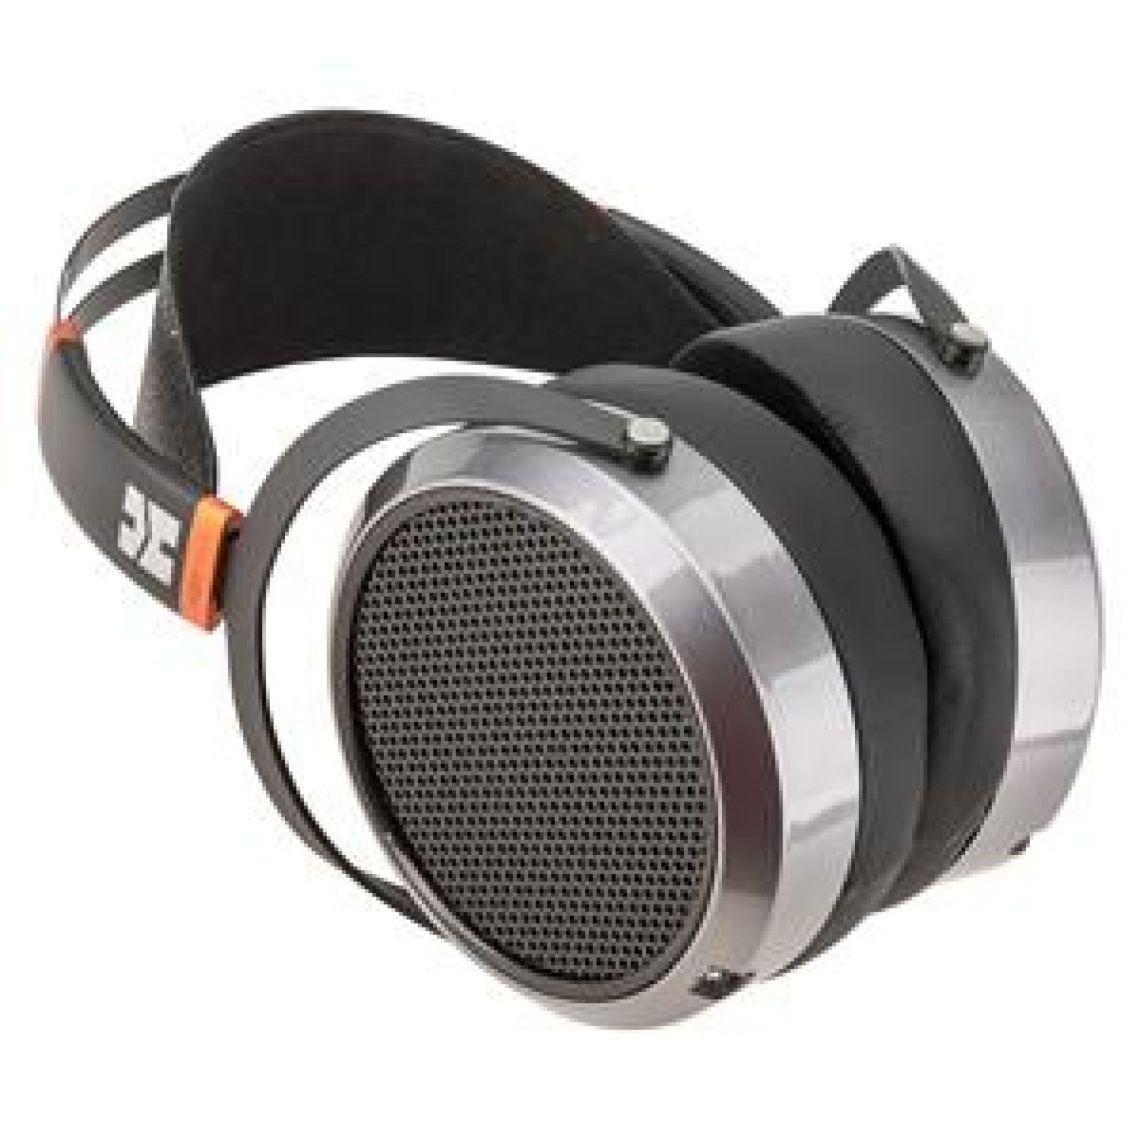 HiFiMan HE-560 V3 Premium Planar Magnetic Headphones